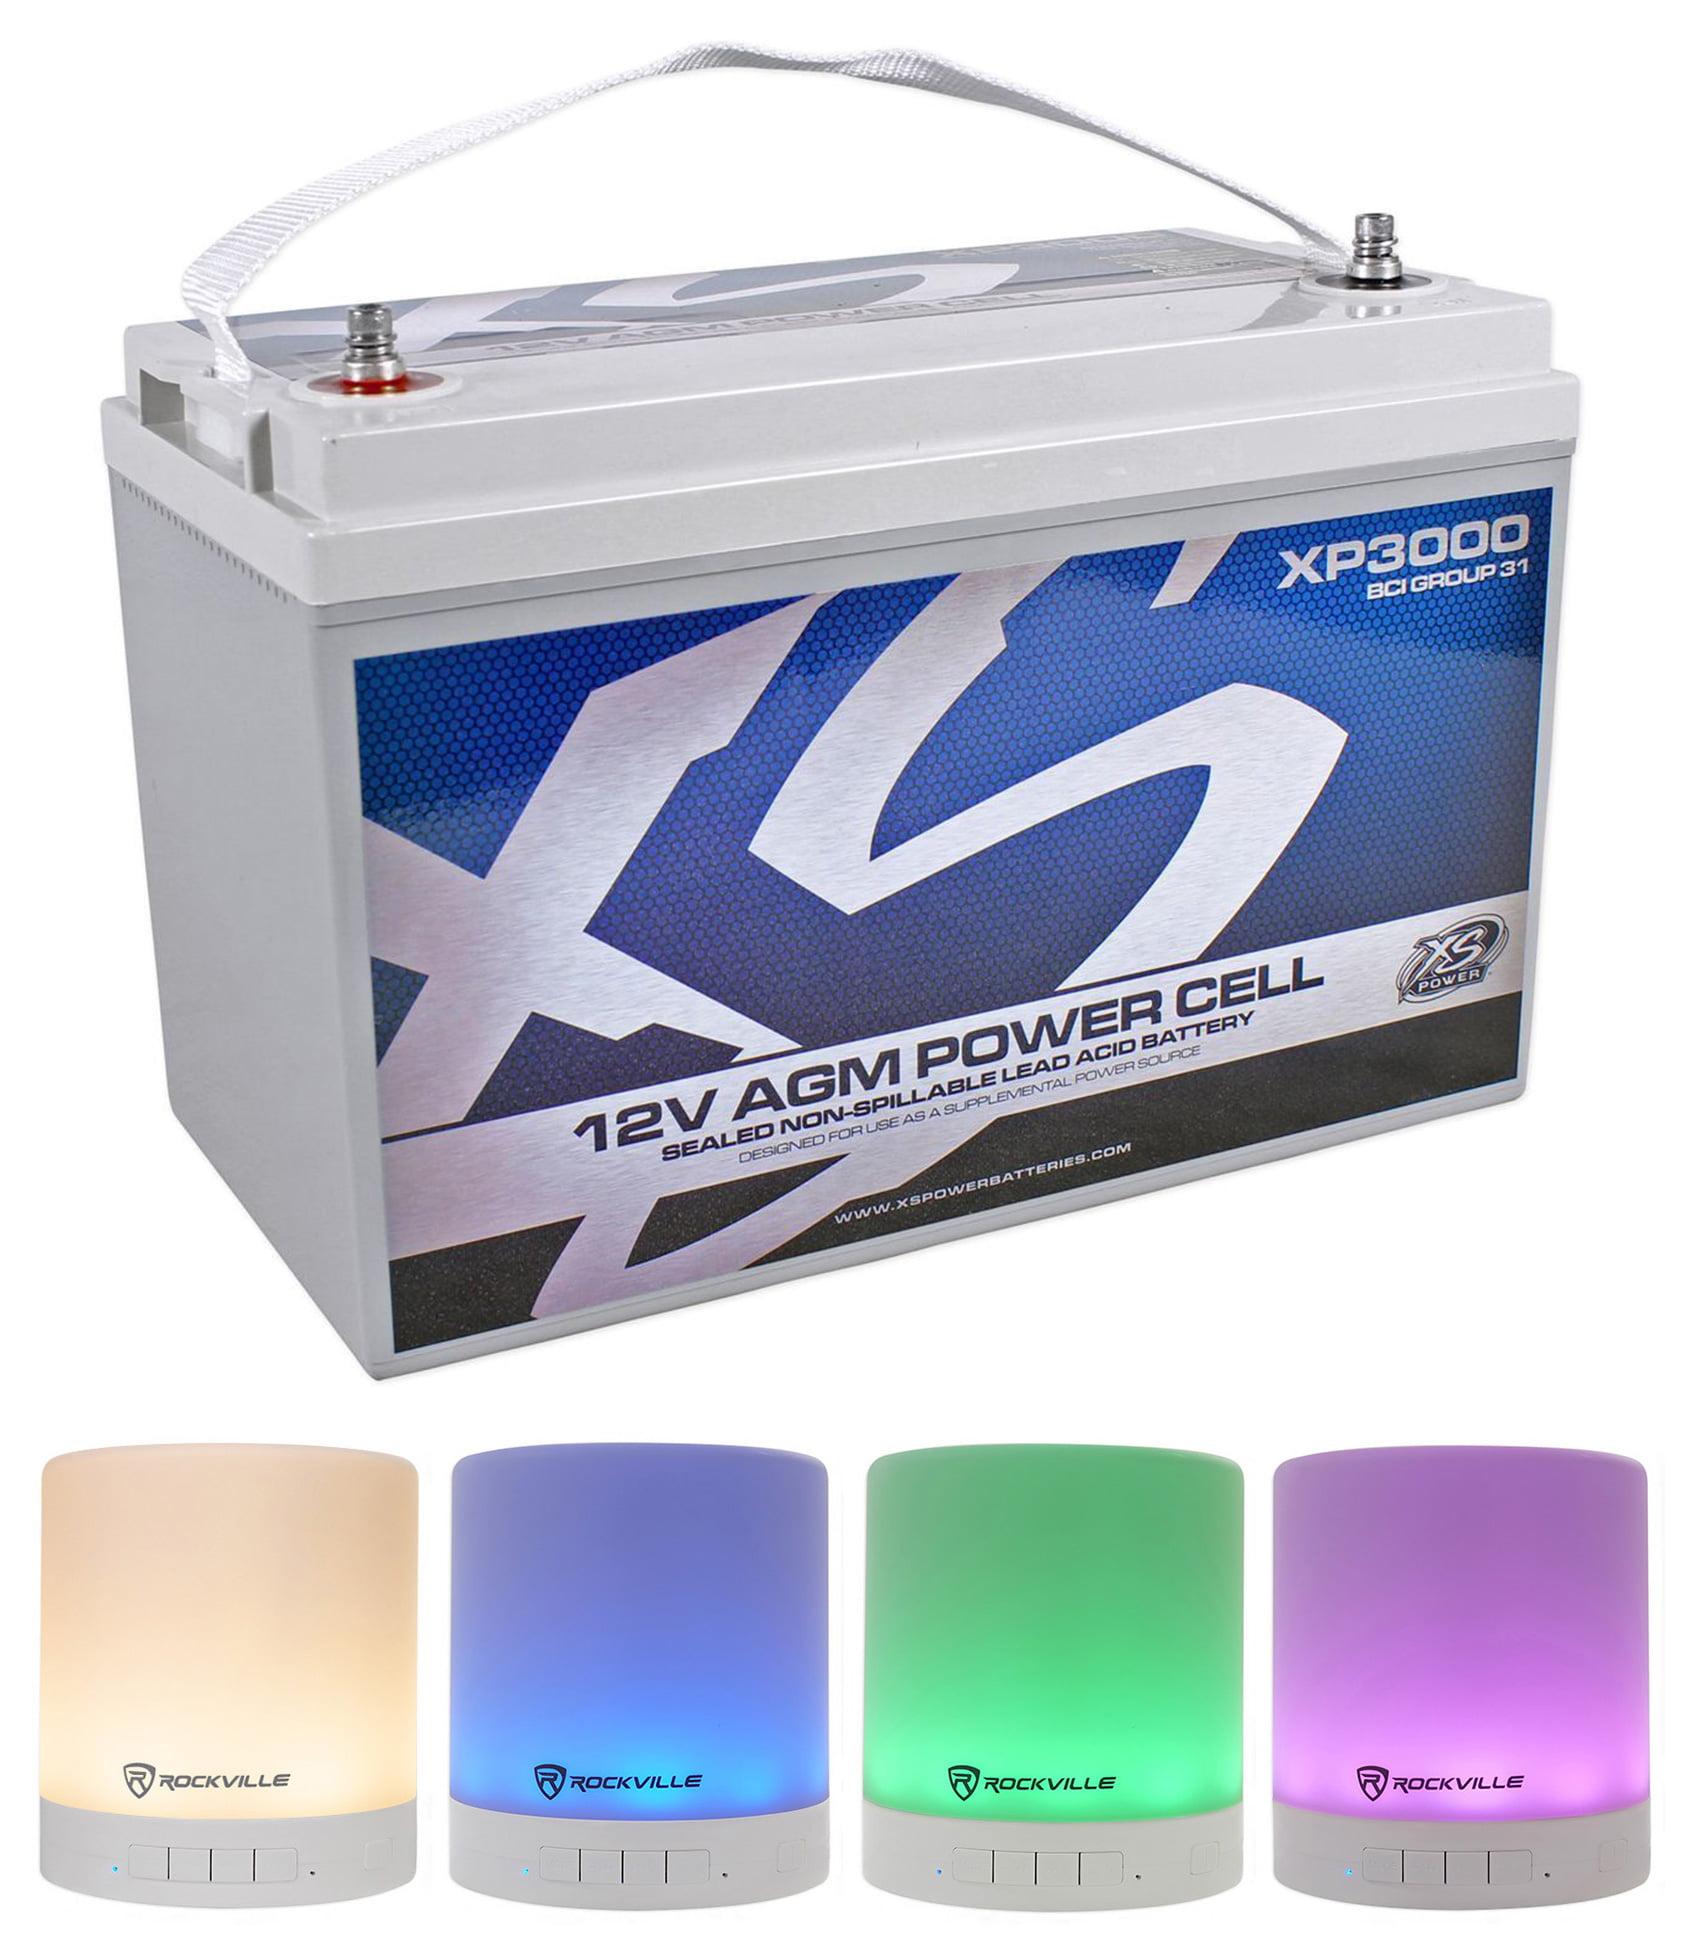 xs power xp3000 3000w power cell car audio battery stereo system Car Stereo Battery xs power xp3000 3000w power cell car audio battery stereo system free speaker